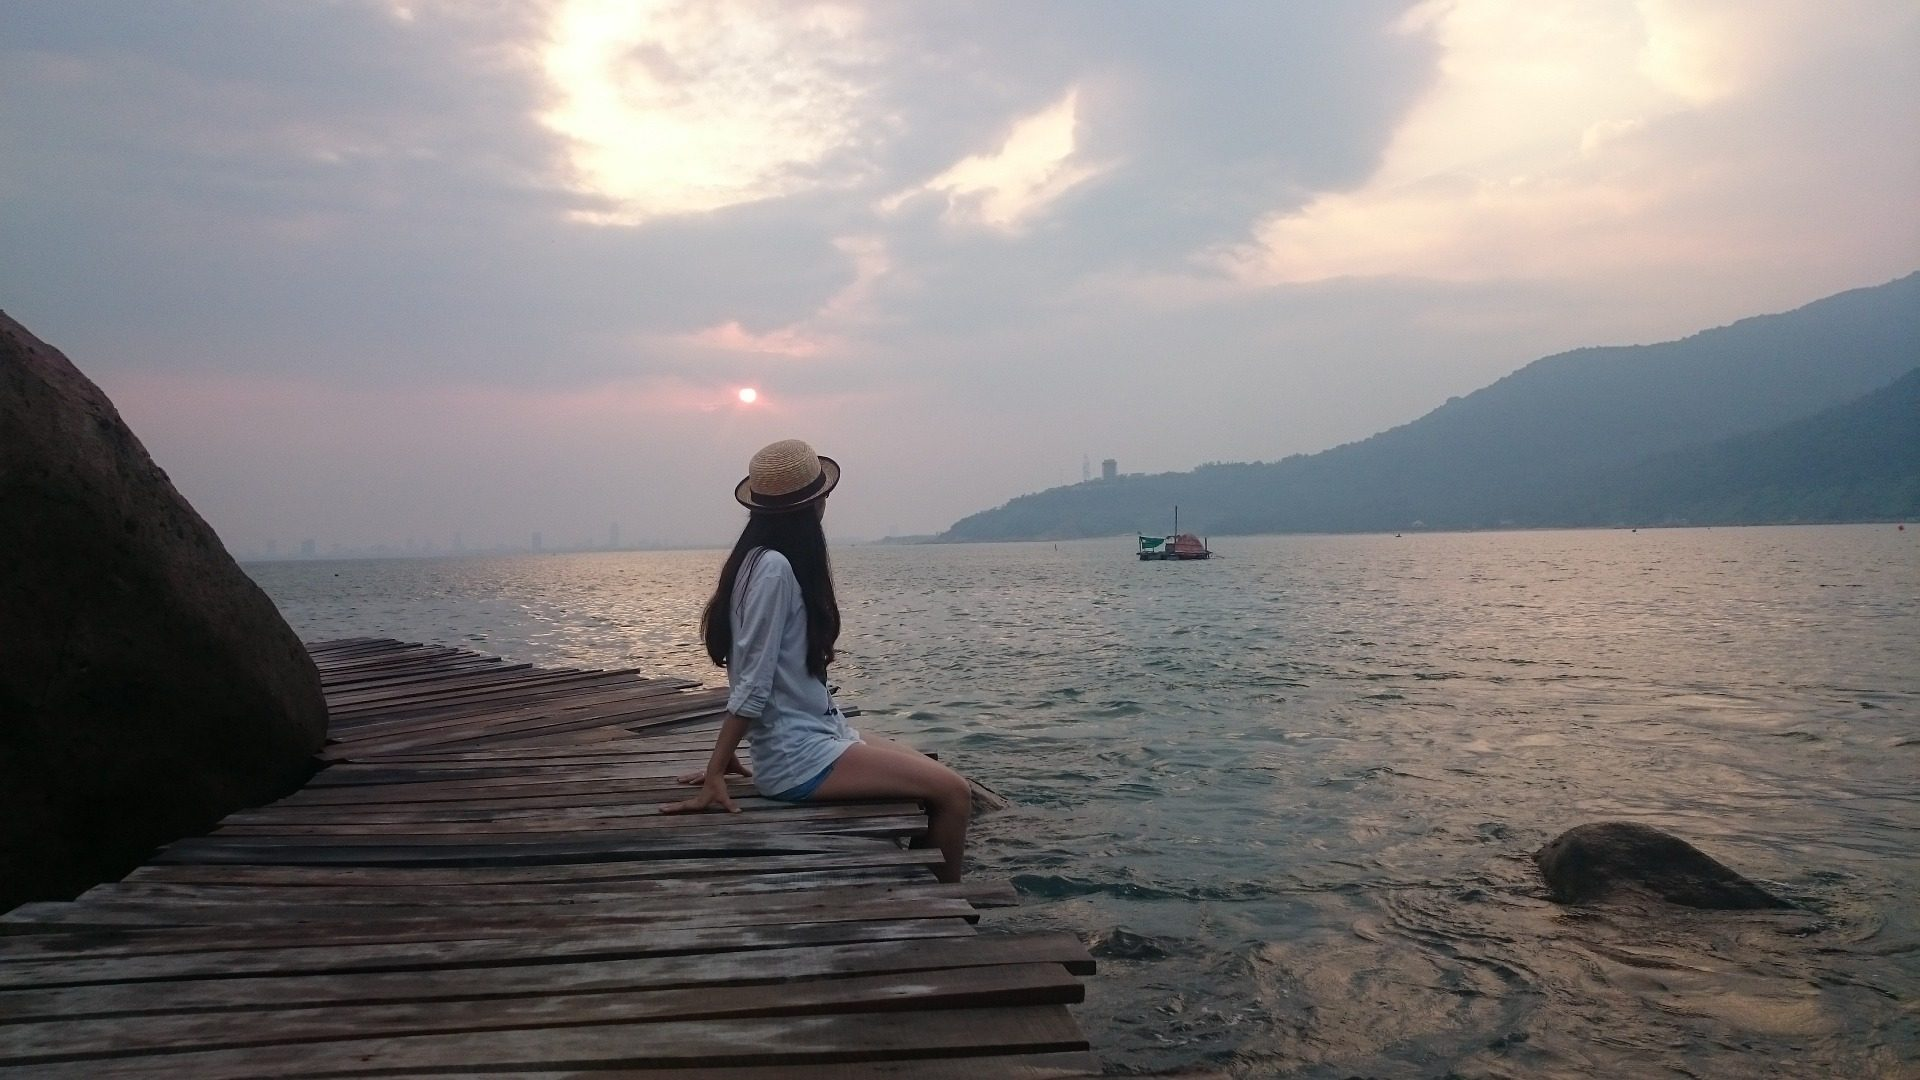 menina, mulher, Mar, Pôr do sol, Relaxe, água, montañas - Papéis de parede HD - Professor-falken.com